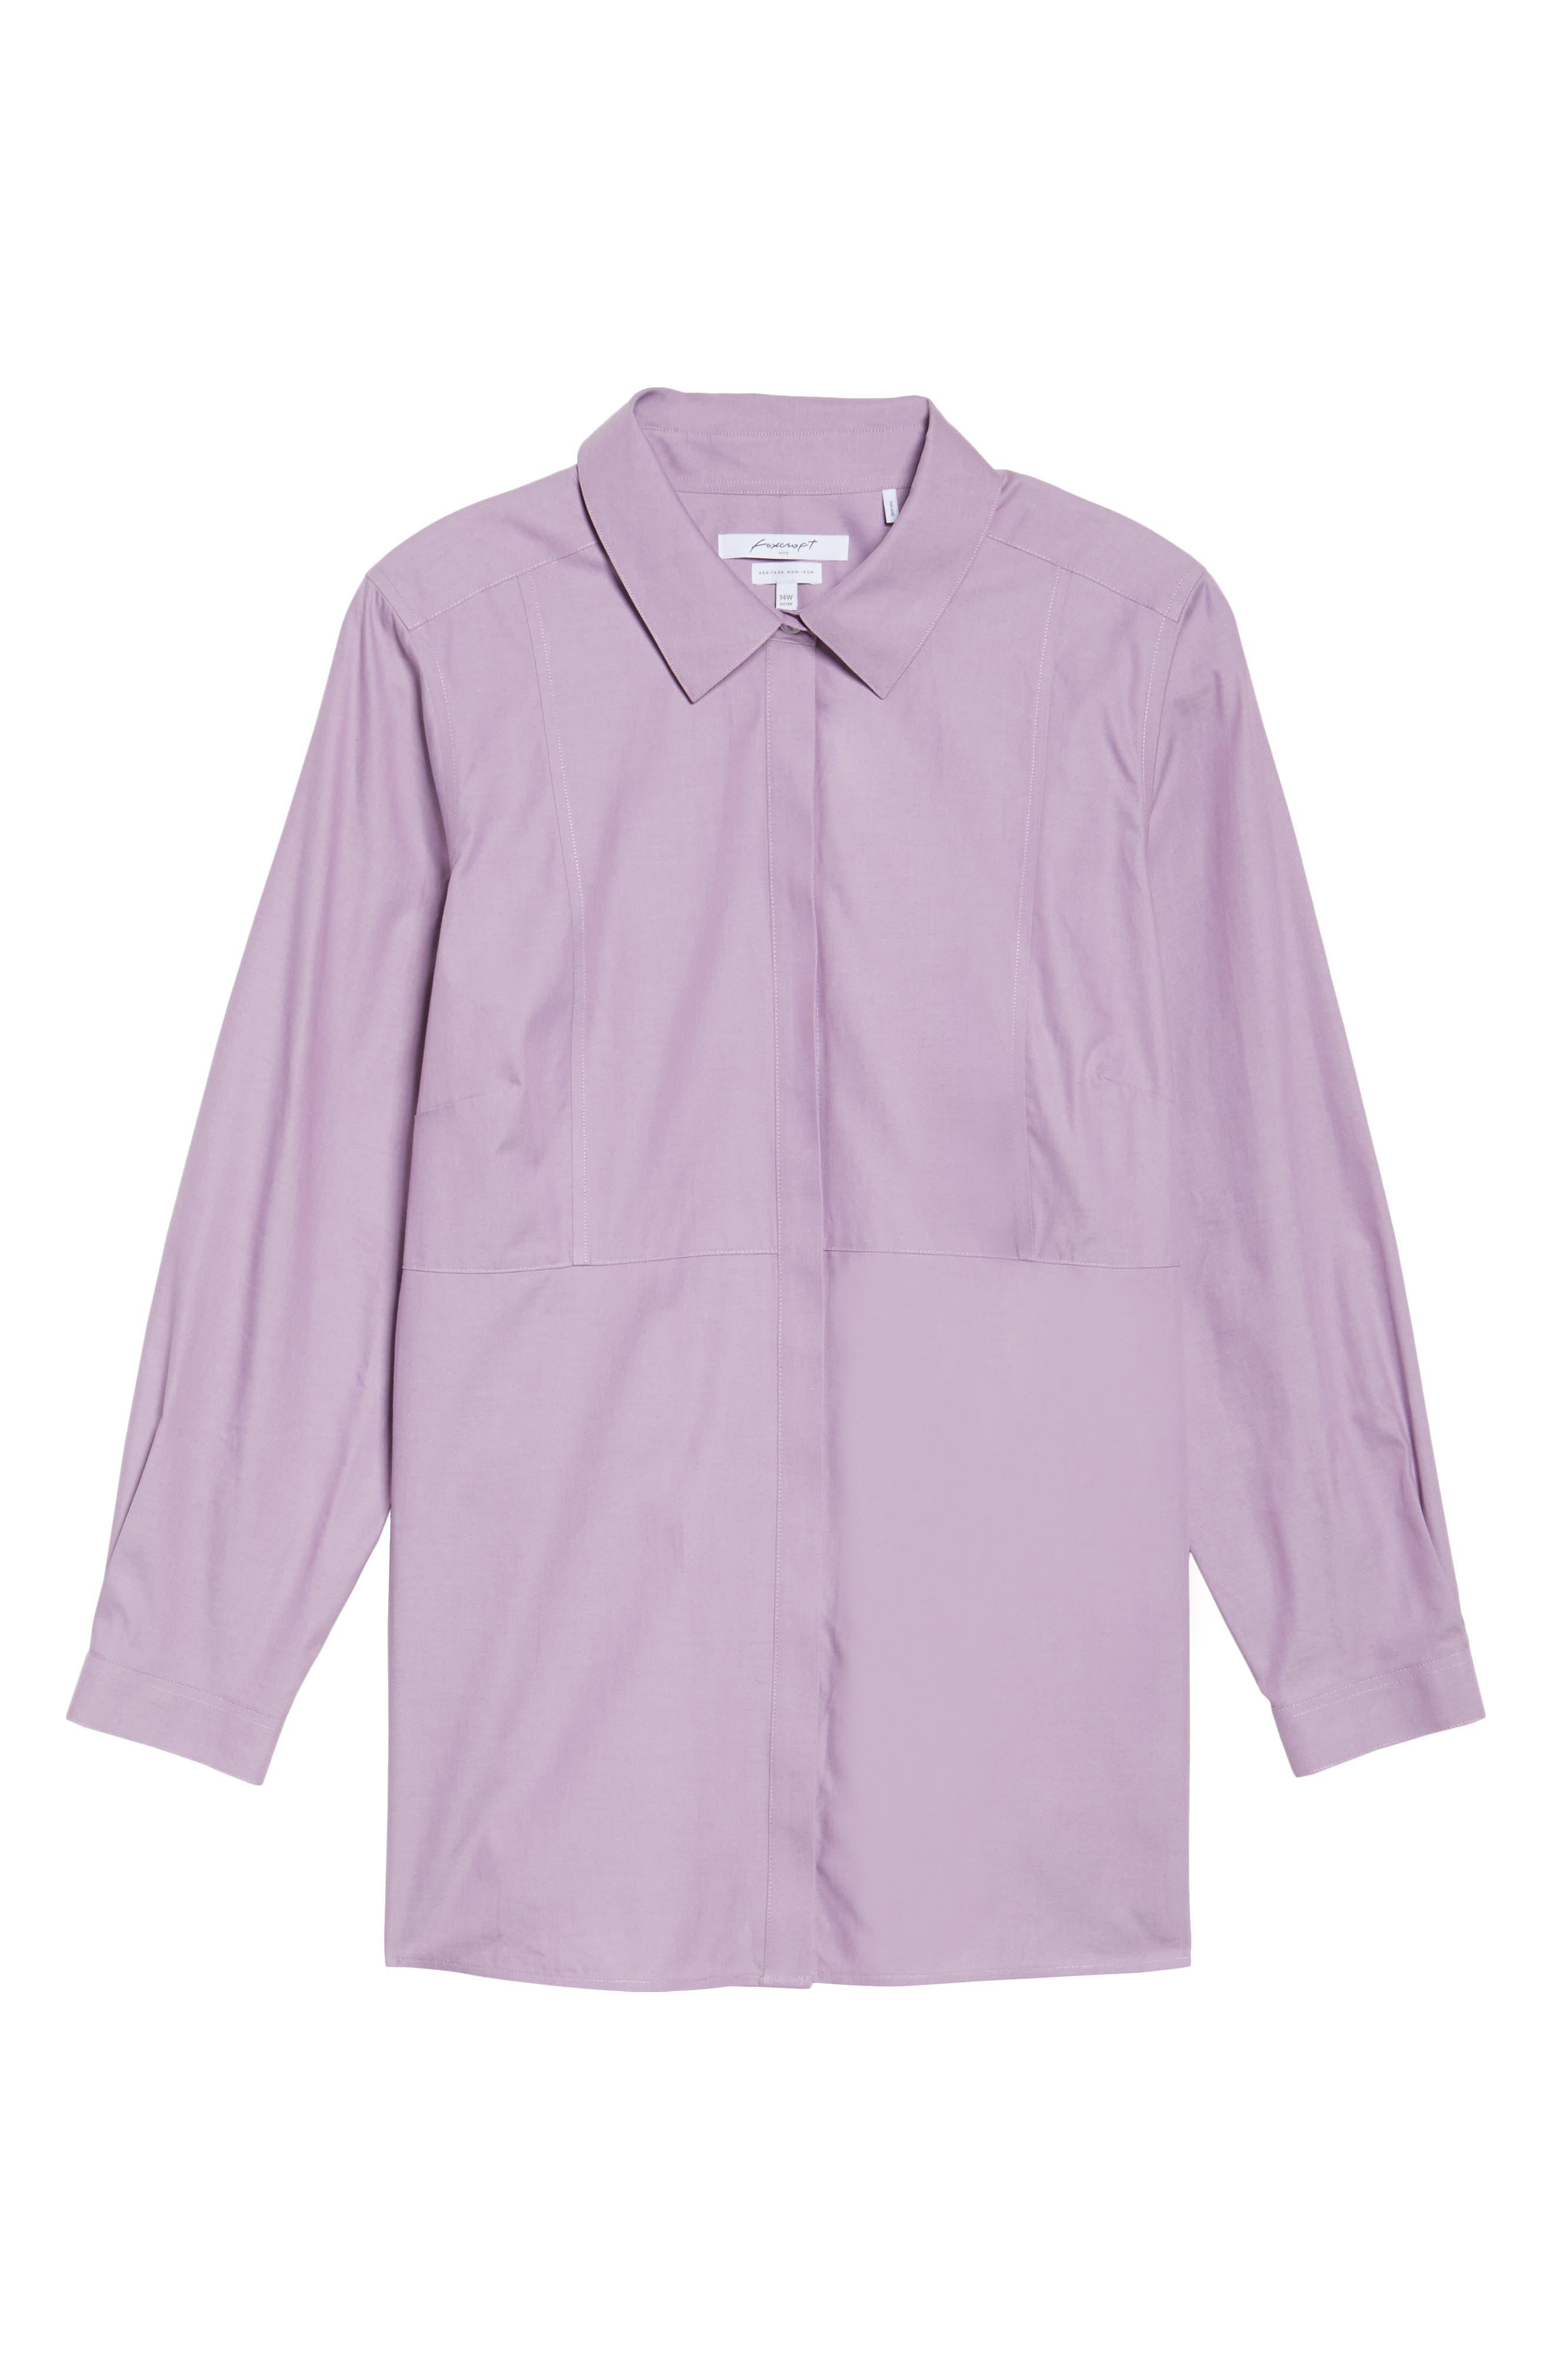 Pinpoint Oxford Cloth Shirt,                             Alternate thumbnail 6, color,                             Mauve